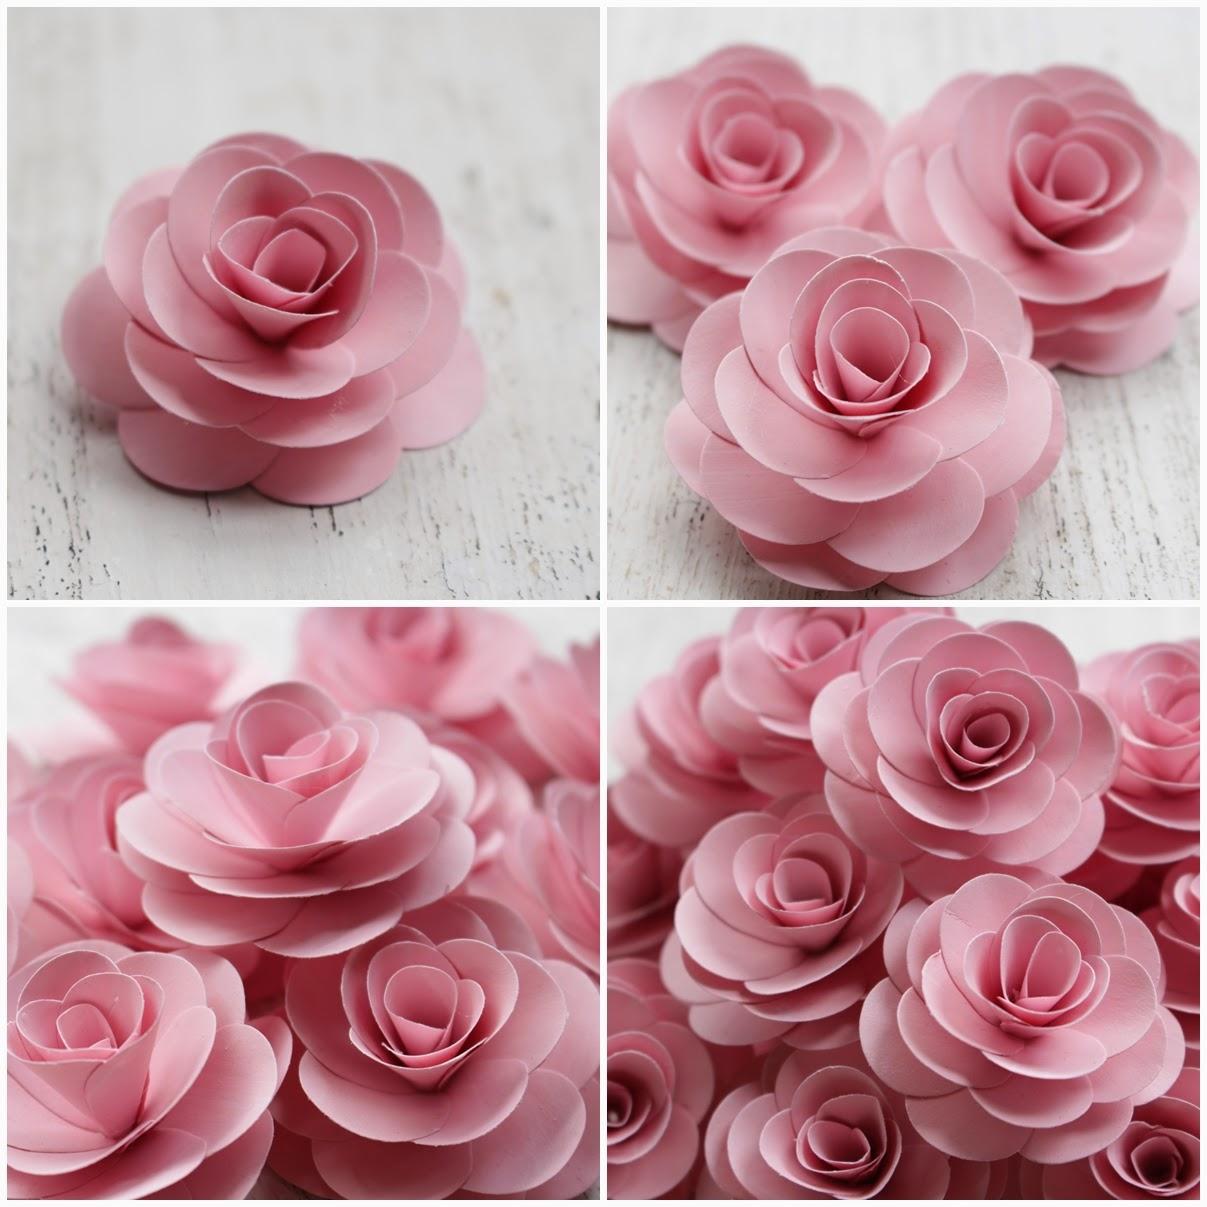 Making Of Paper Using Rose And Custom Paper Help Crhomeworkttkz